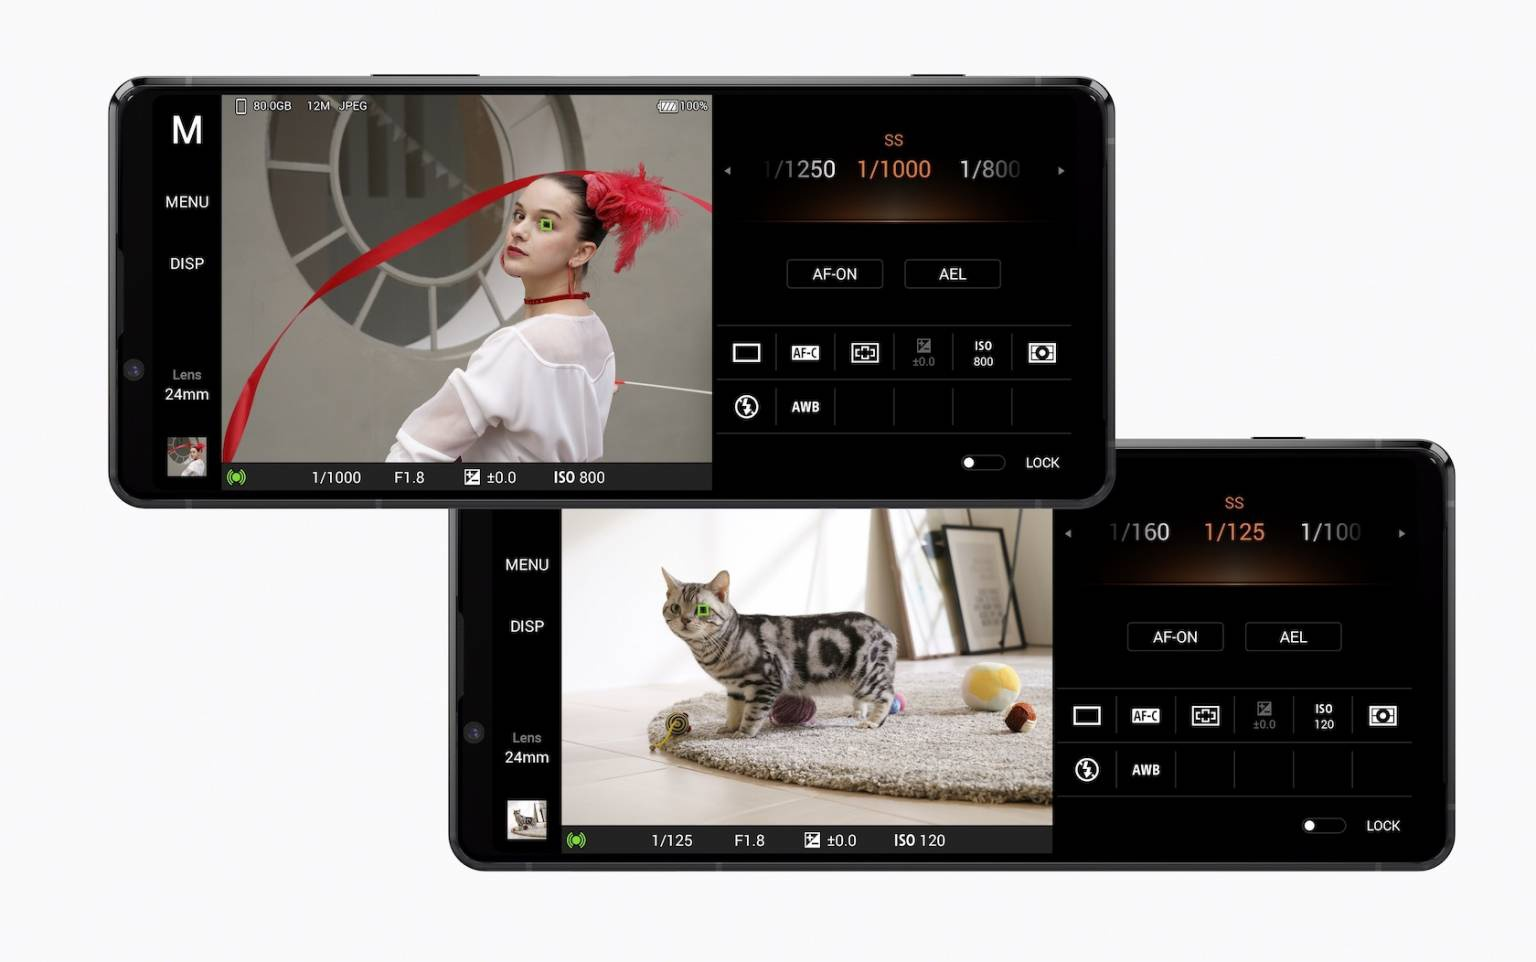 Vi sao smartphone Sony khong te nhung van that bai? hinh anh 2 sony_1.jpg